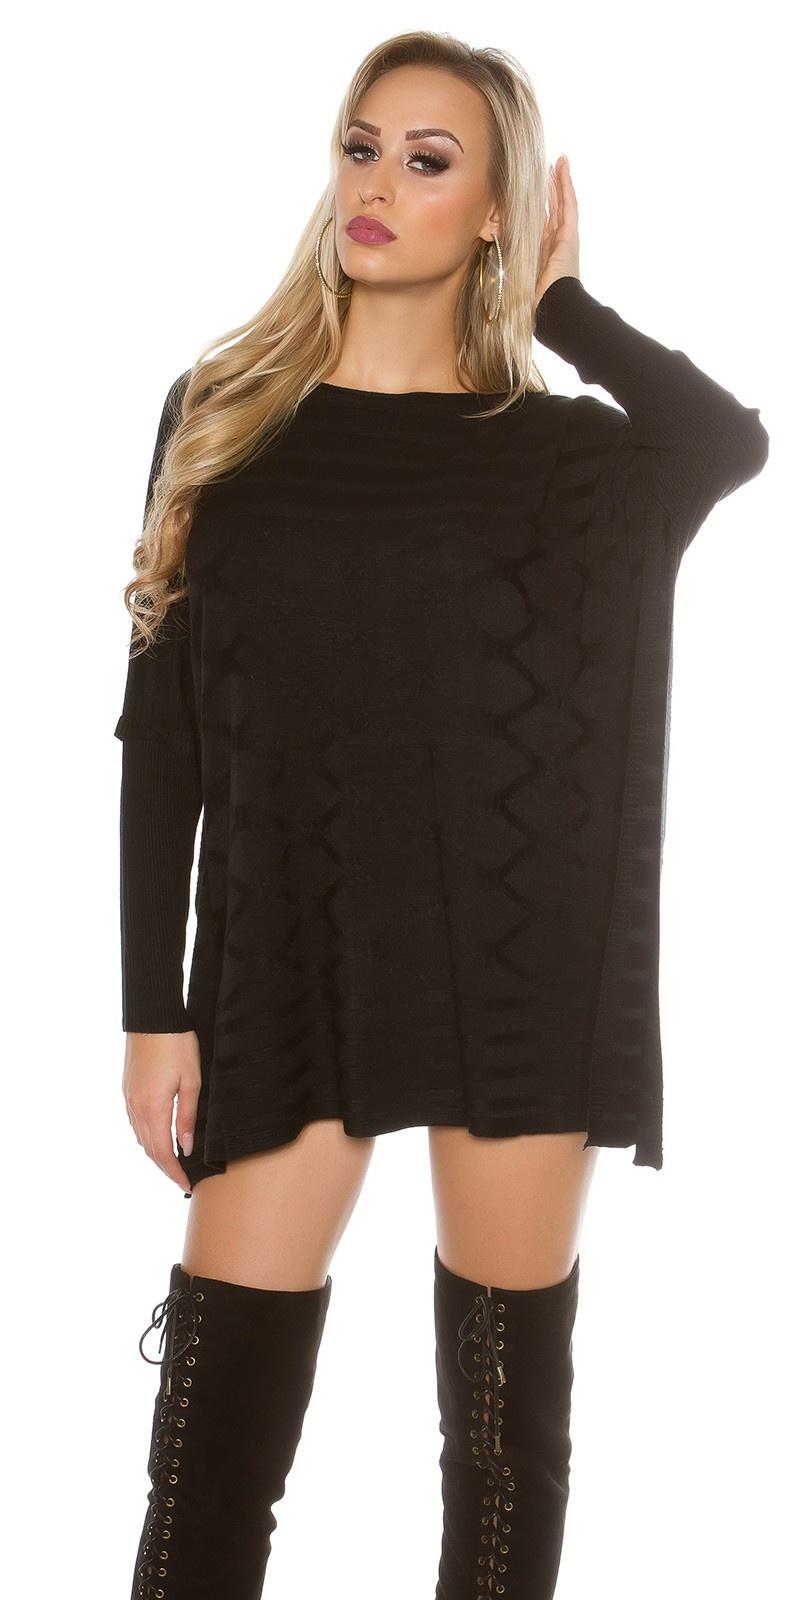 Oversized Vleermuis-trui Zwart